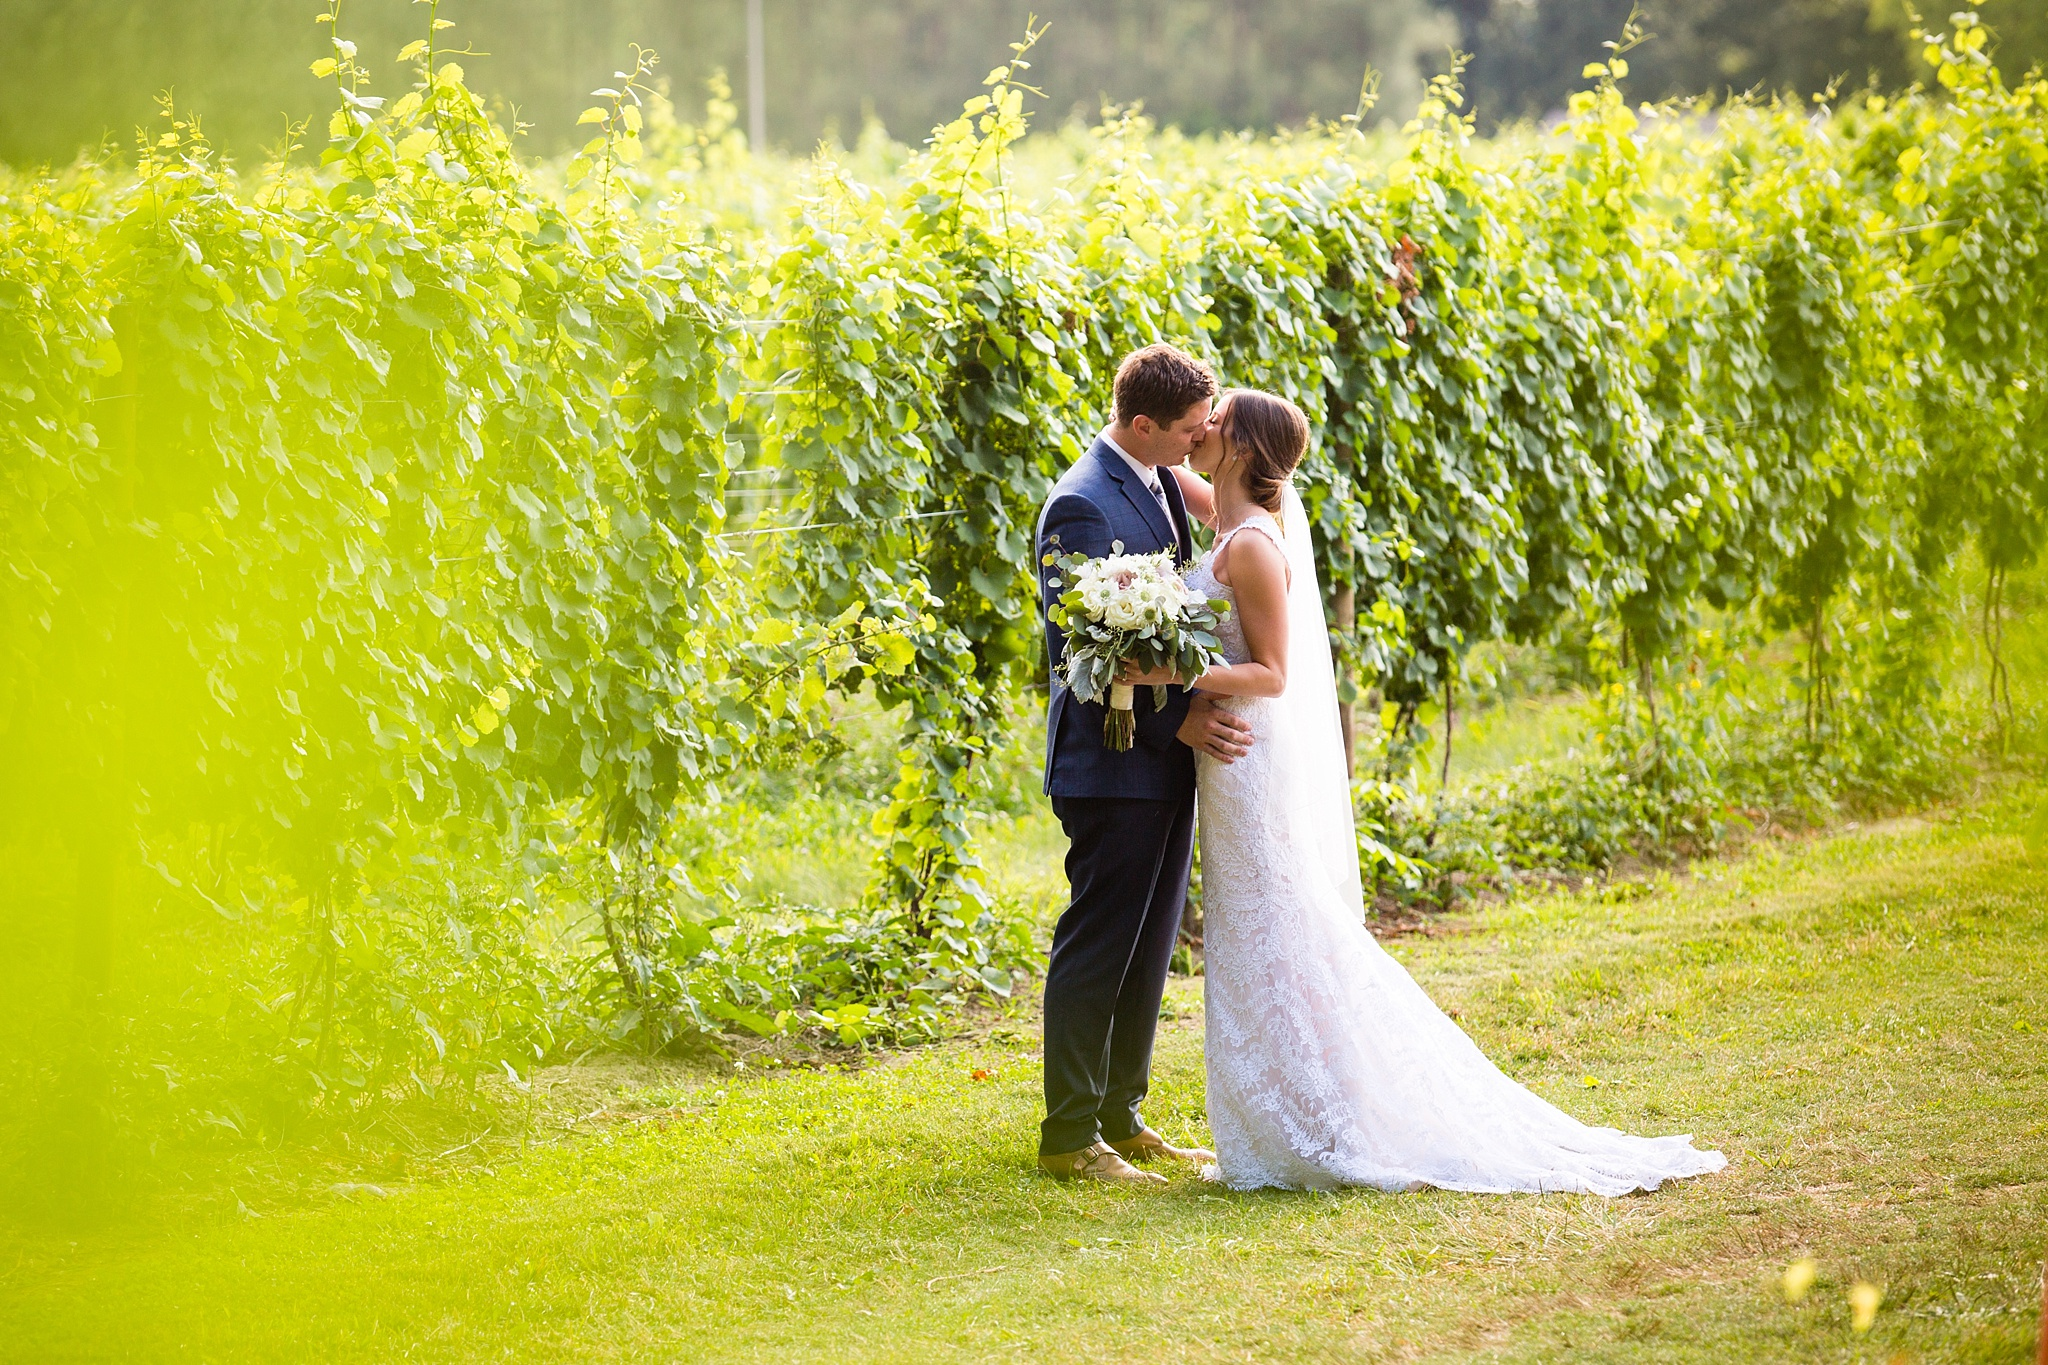 Tim&Polly_Wedding_12CornerVineyard_blog069.jpg